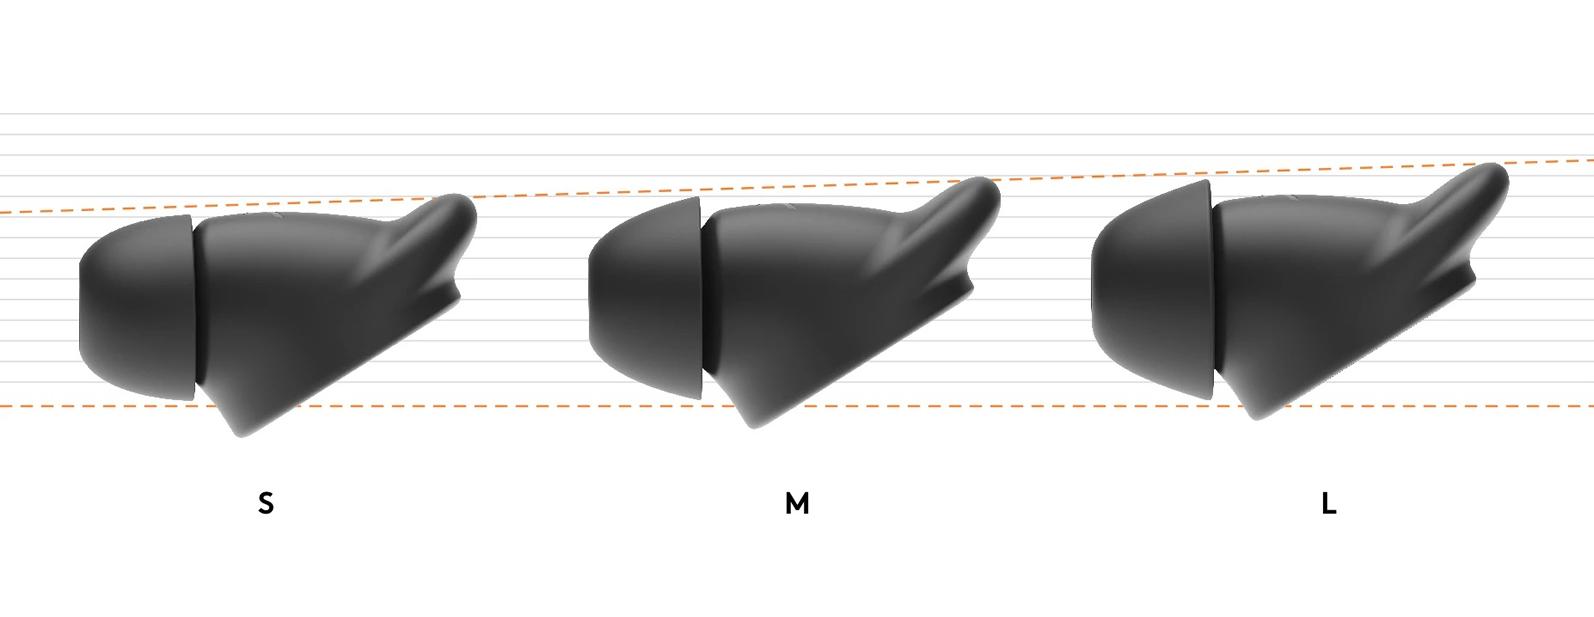 Logitech Zone Wired Earbuds tre dimensioni   DV Informatica